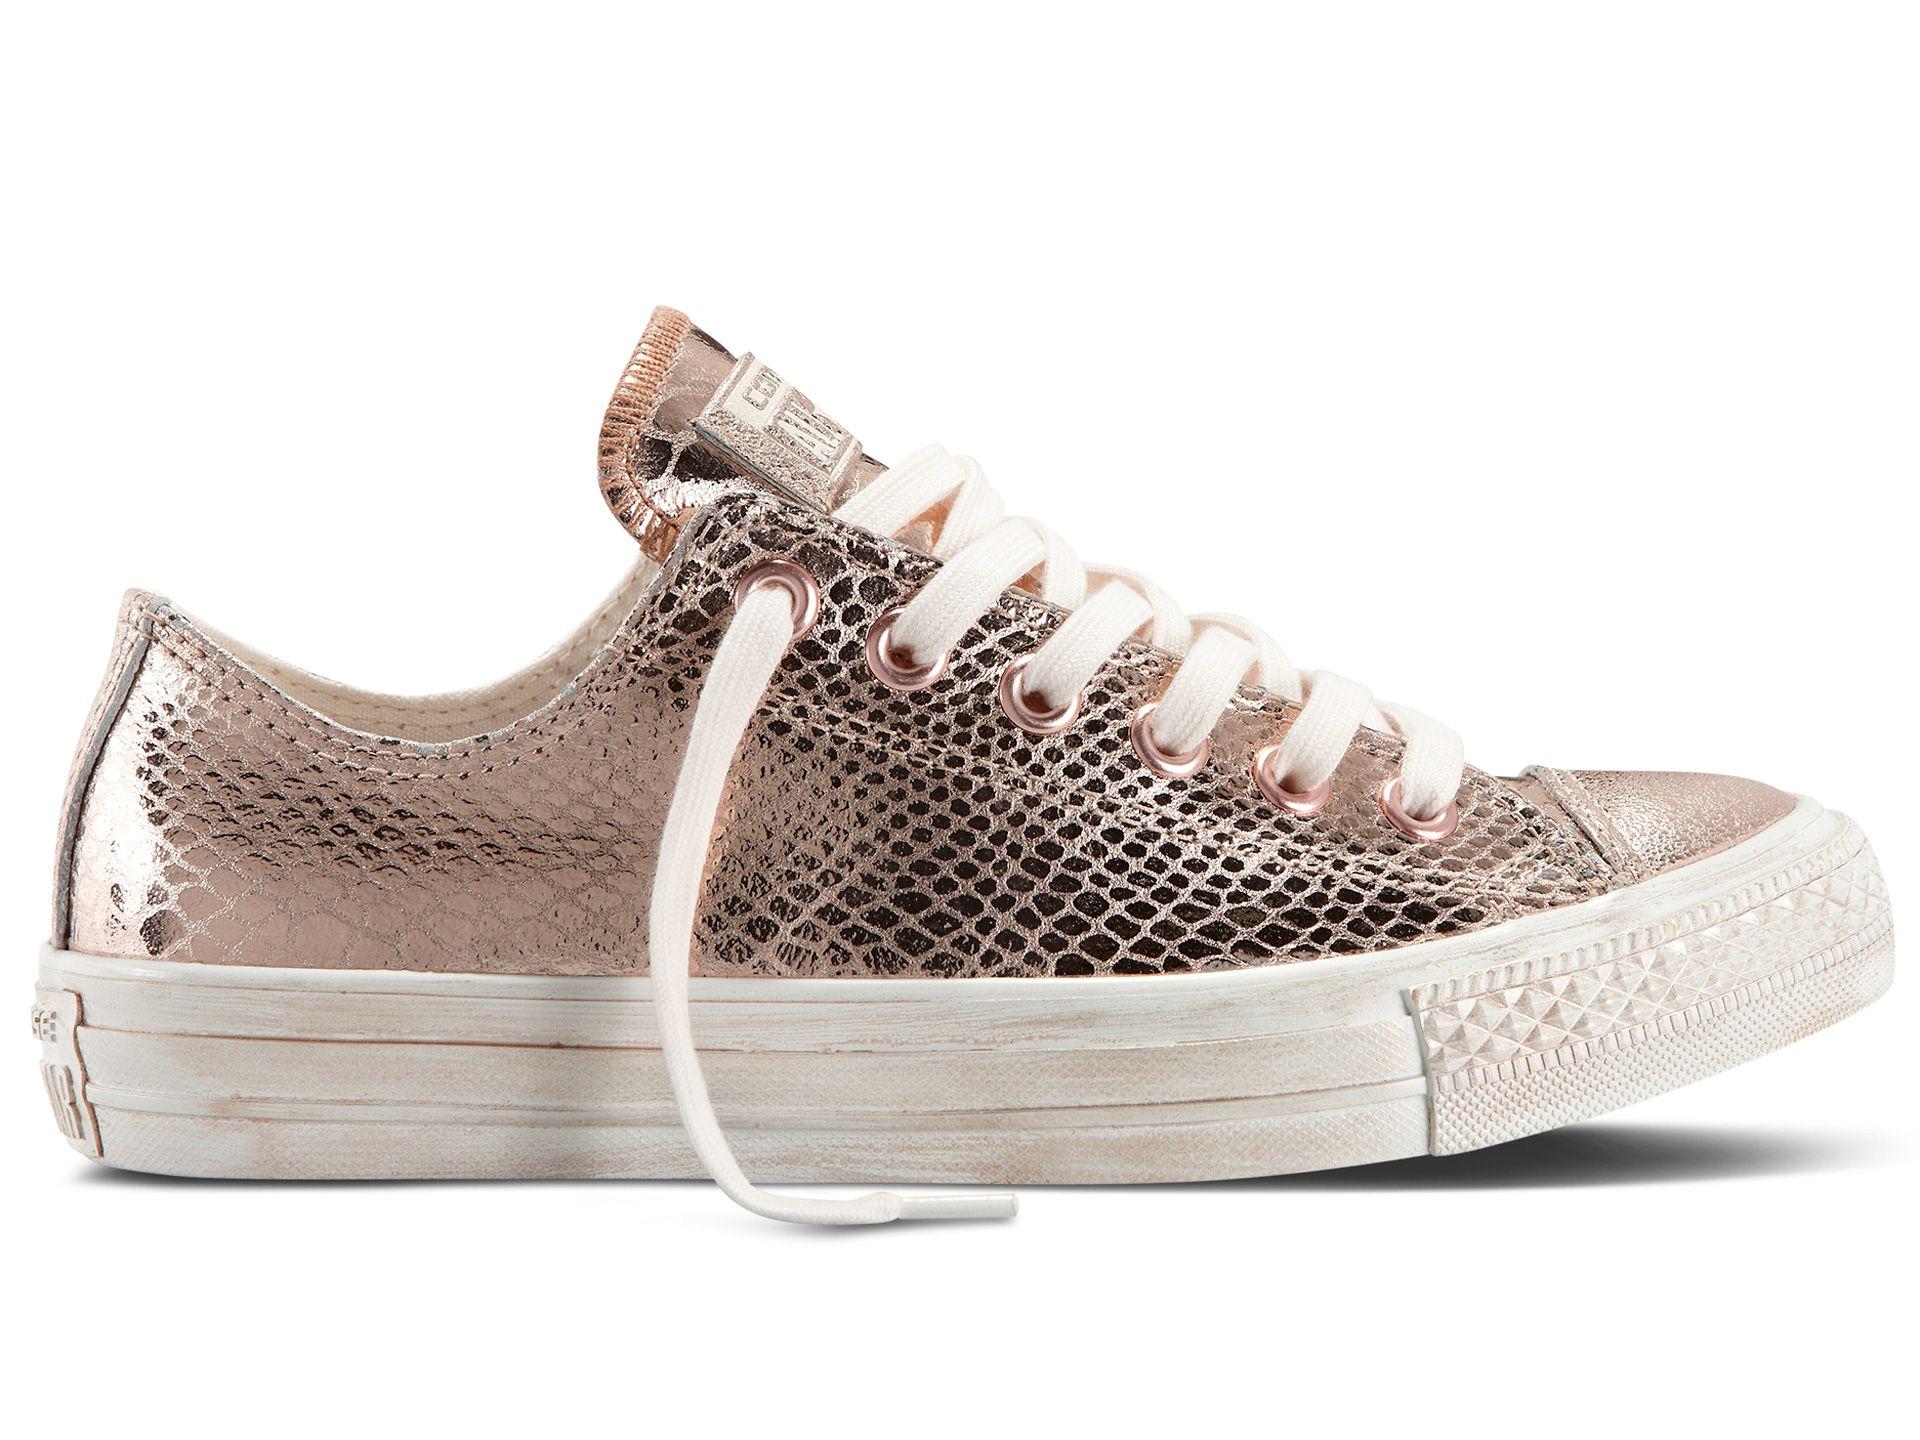 metallic chuck taylor converse sneakers